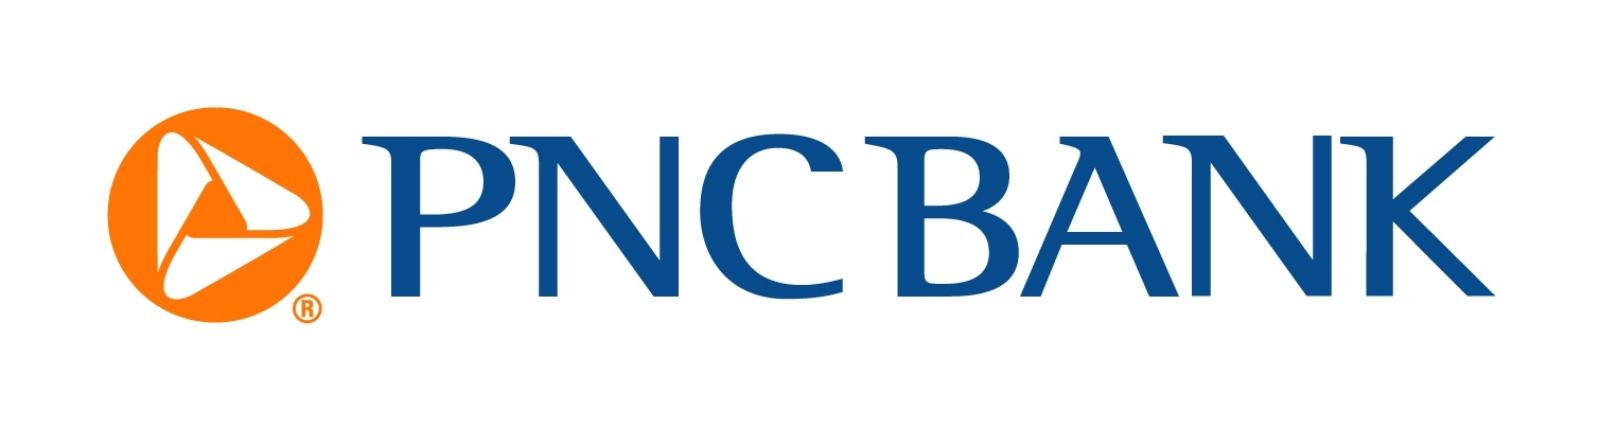 PNC Bank Logo Color.JPG